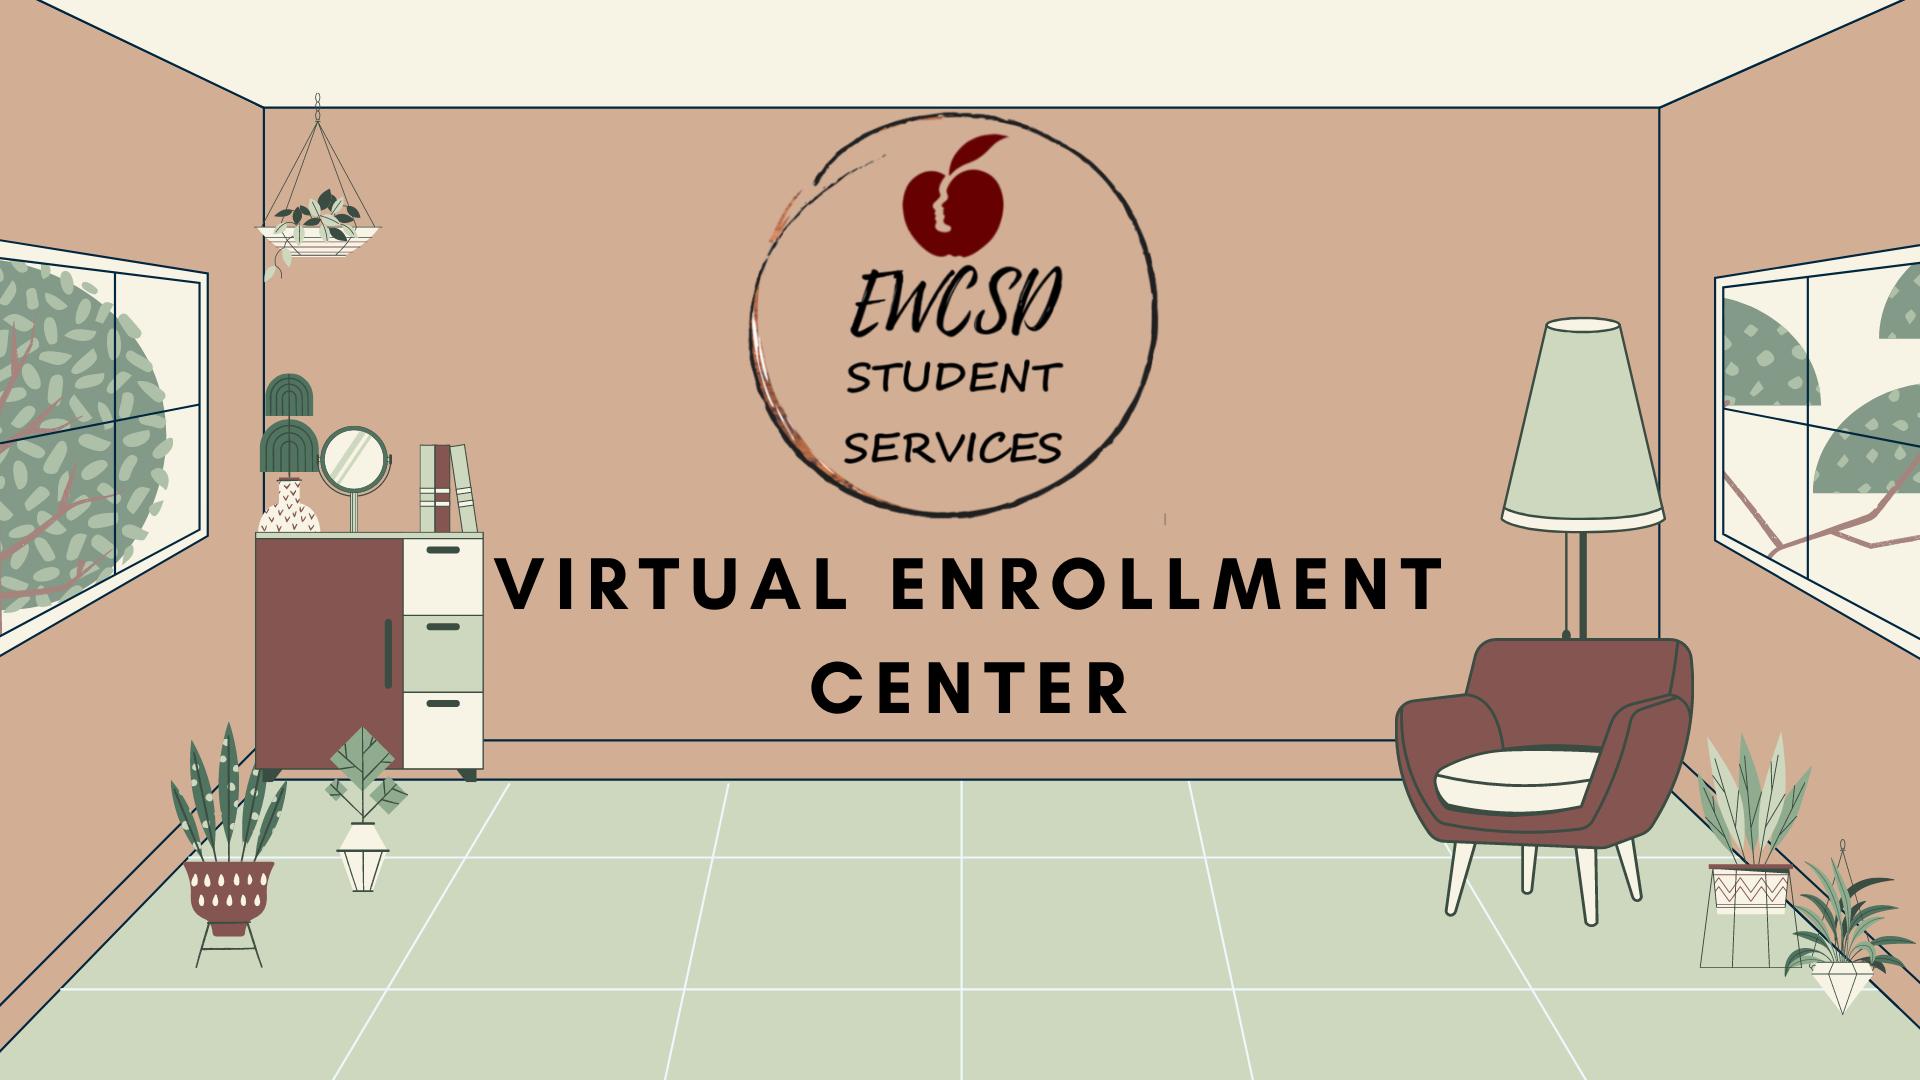 Student Services virtual enrollment center image